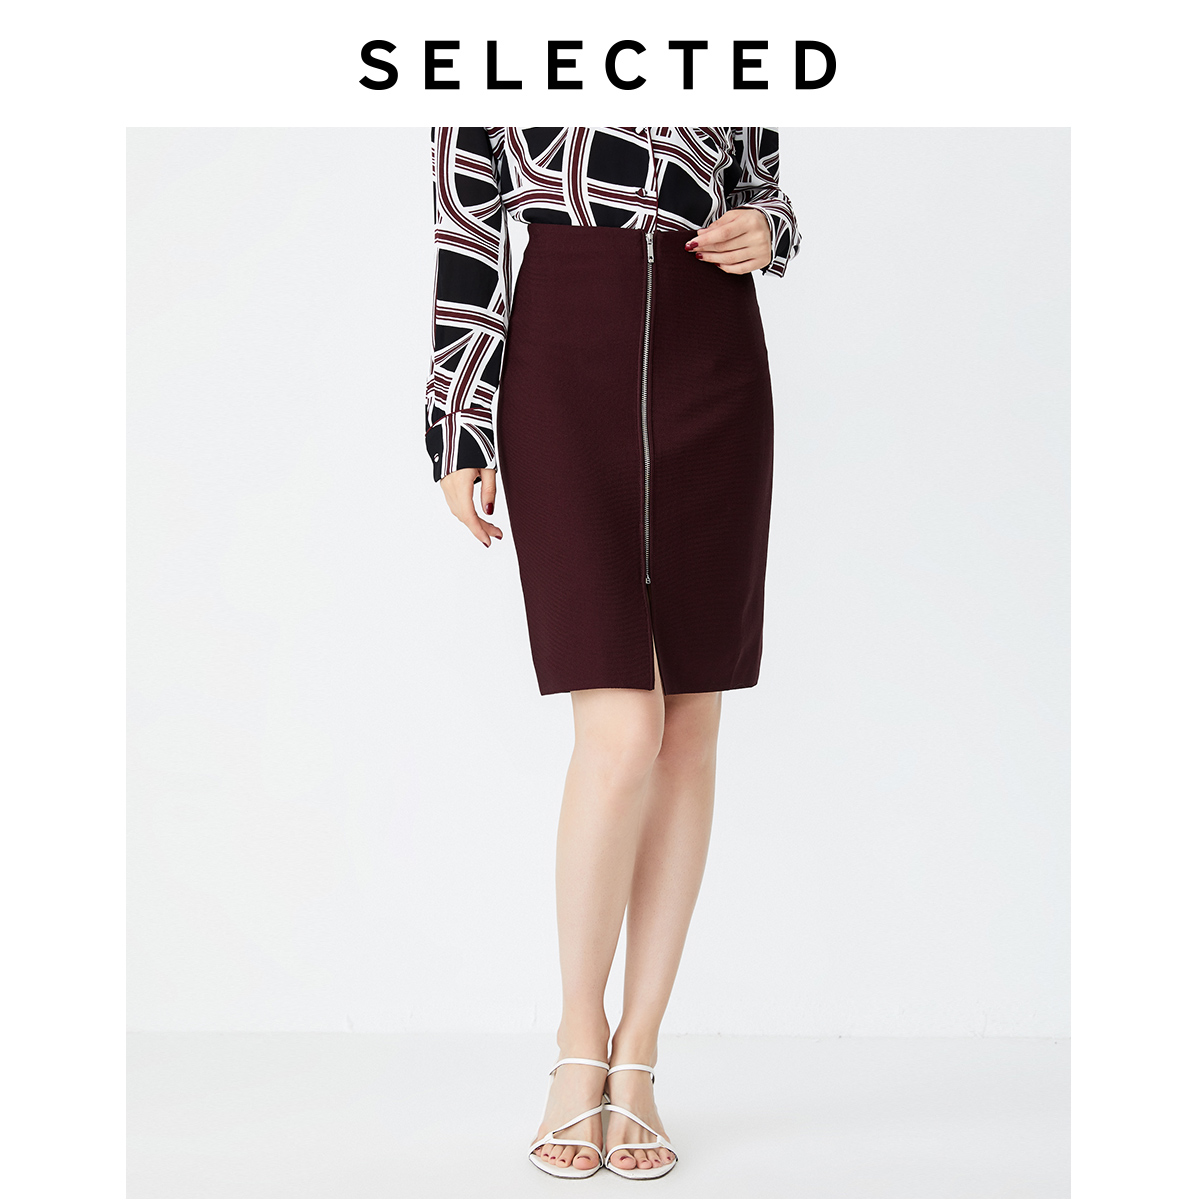 SELECTED Women's High-rise Hip-wrap Straight Regular Fit Hip Skirt S 41931J501